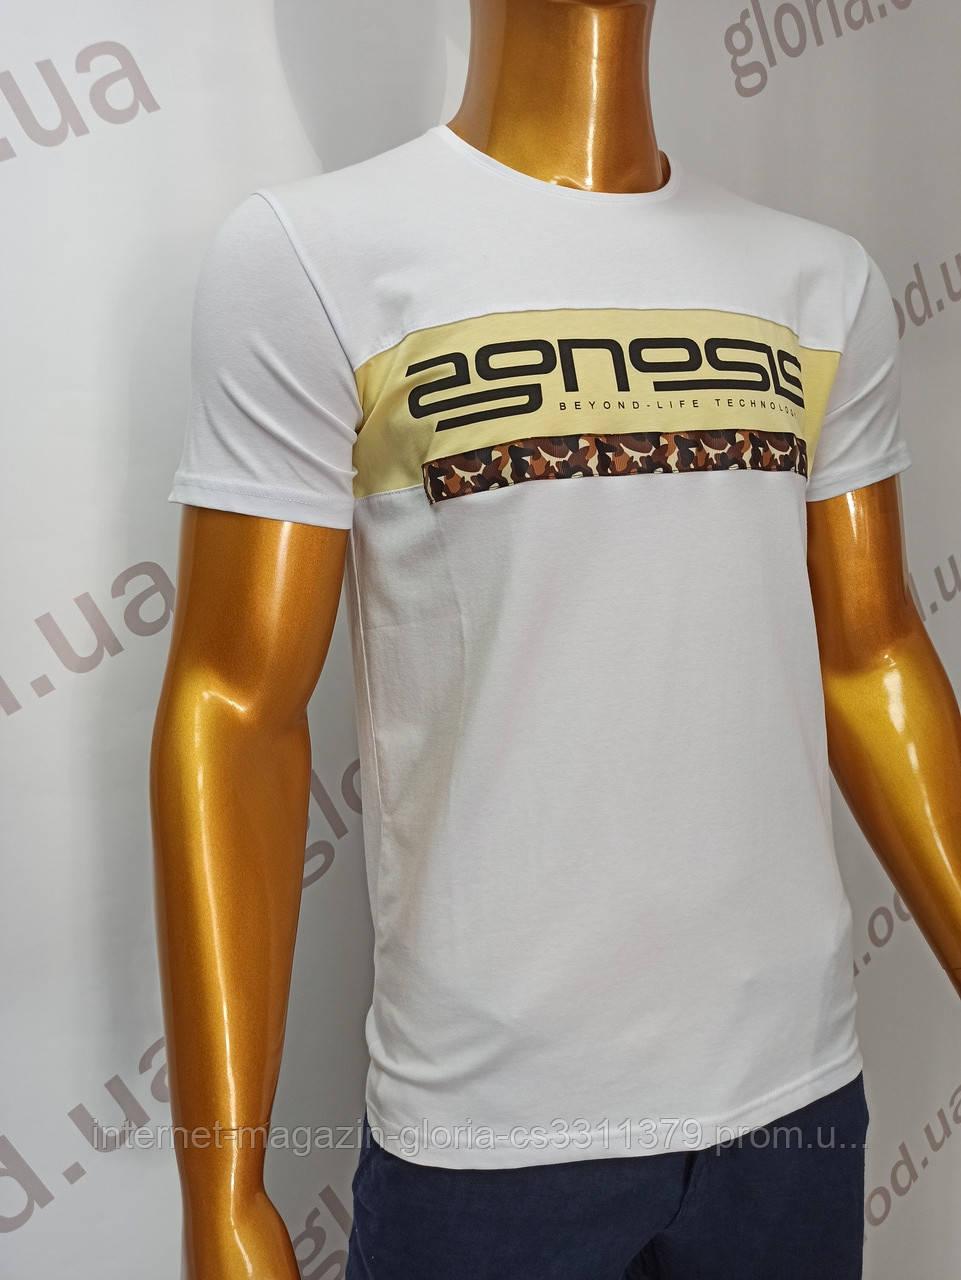 Мужская футболка MSY. 8344. Размеры: M,L,XL,XXL.